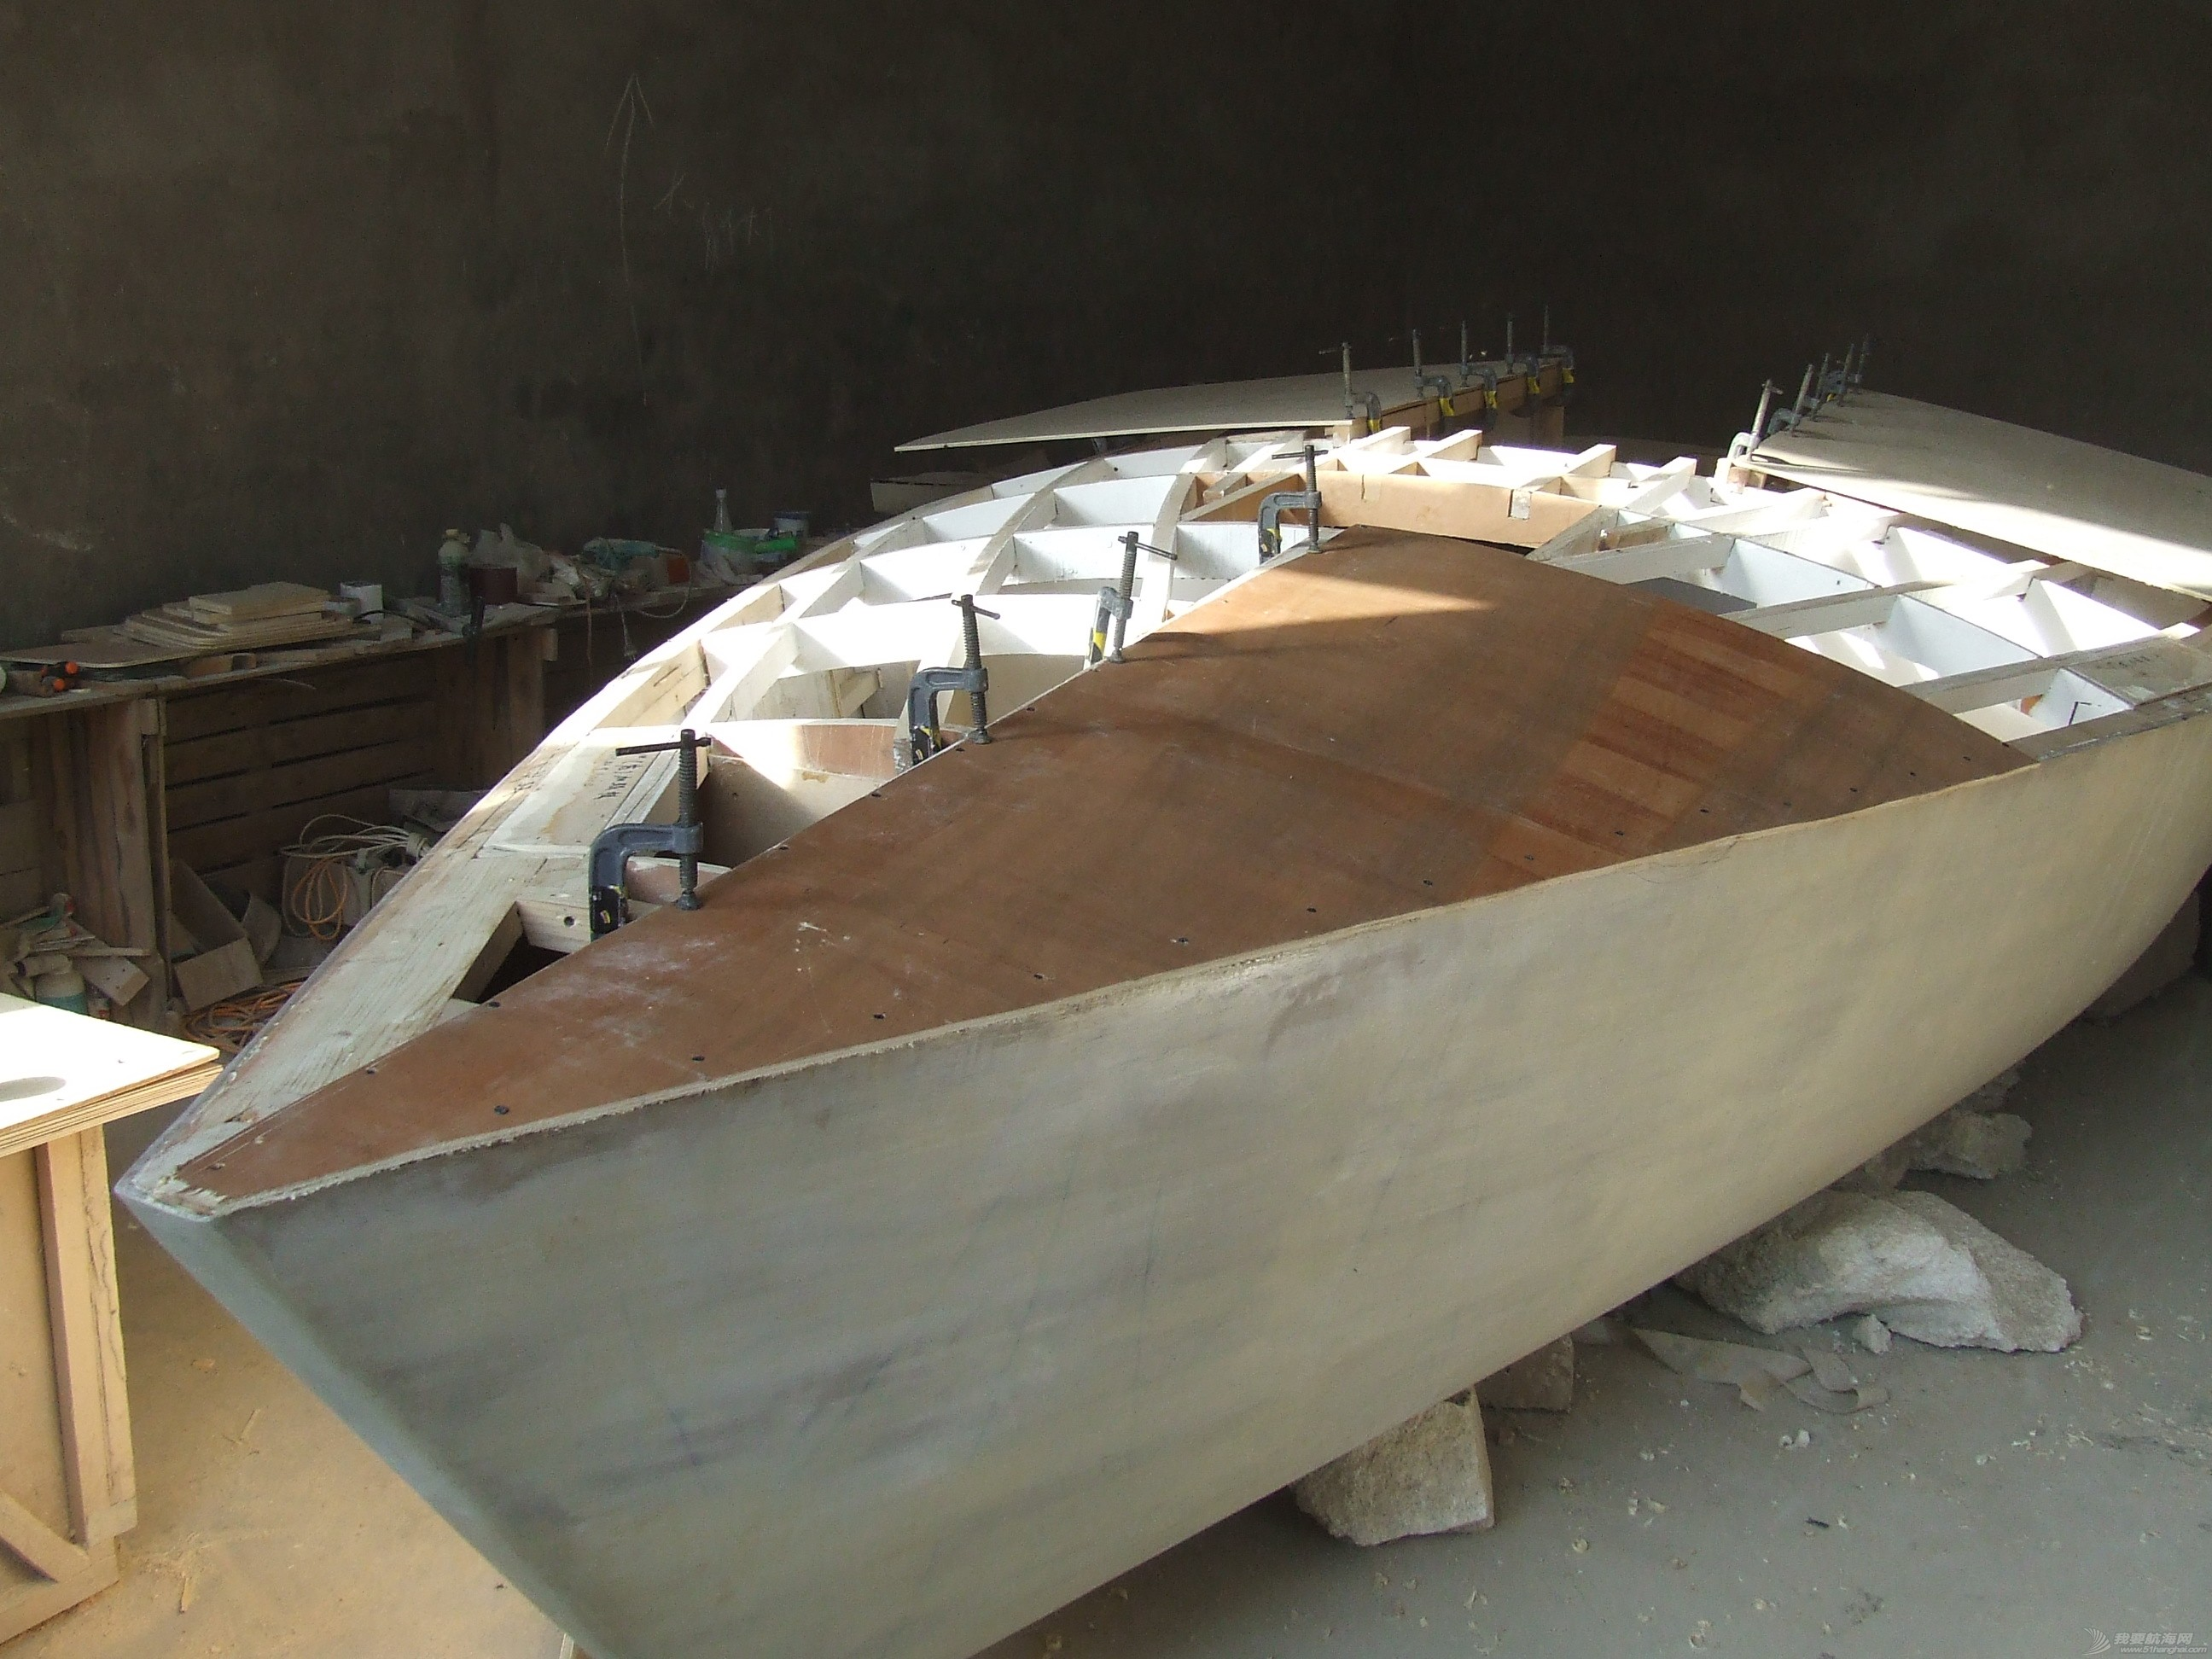 GR-750舱面面板铺装完毕 DSCF5998.JPG